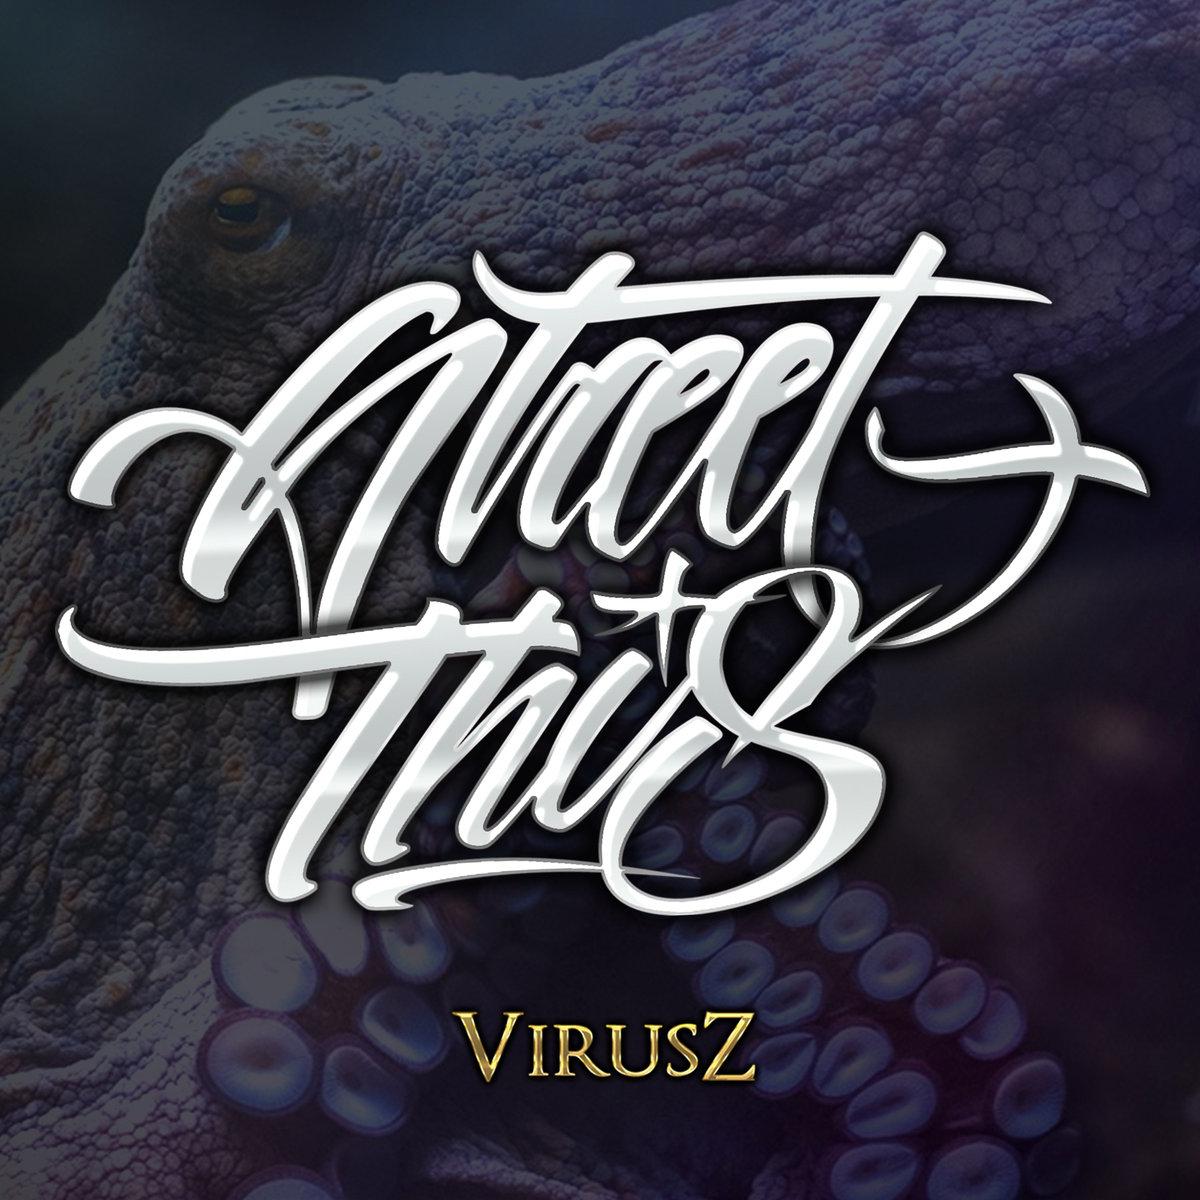 VIRUSZ - 2016 STREET THIS